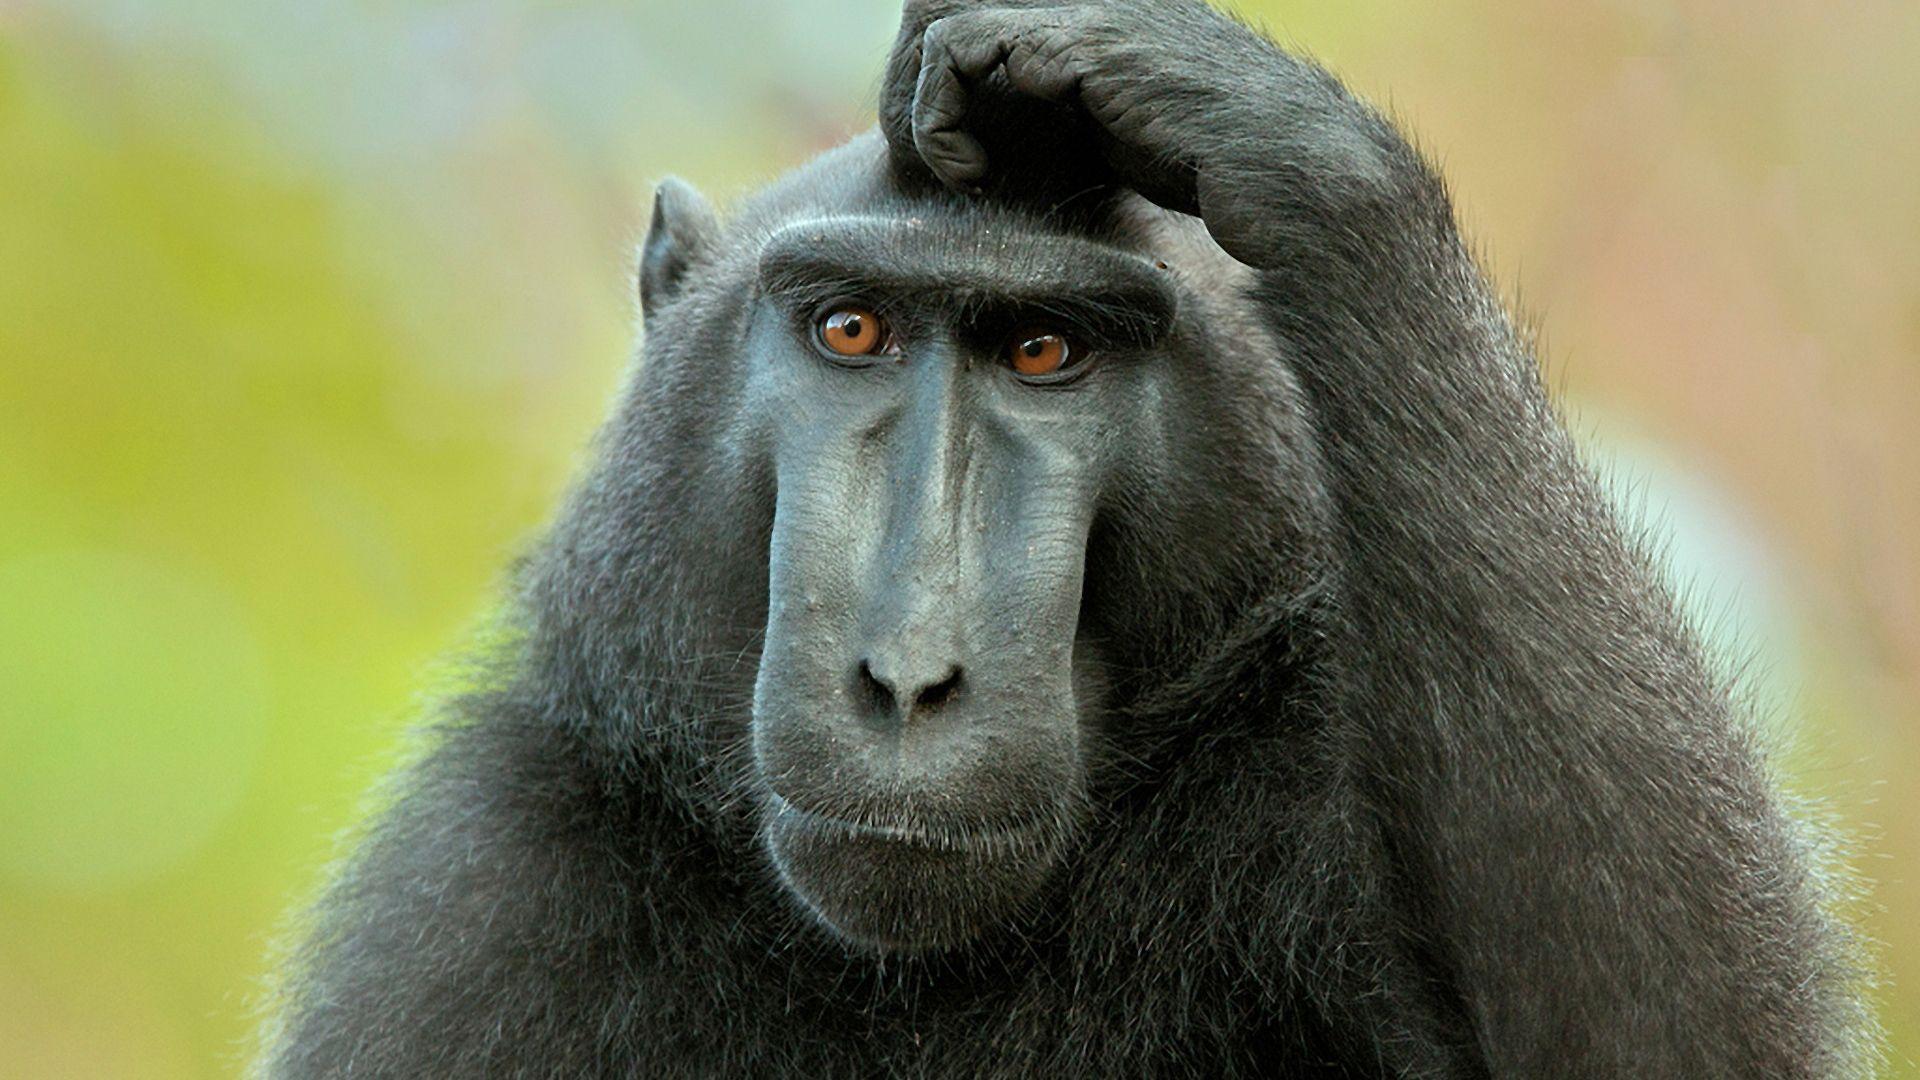 Pensive Monkey Photo